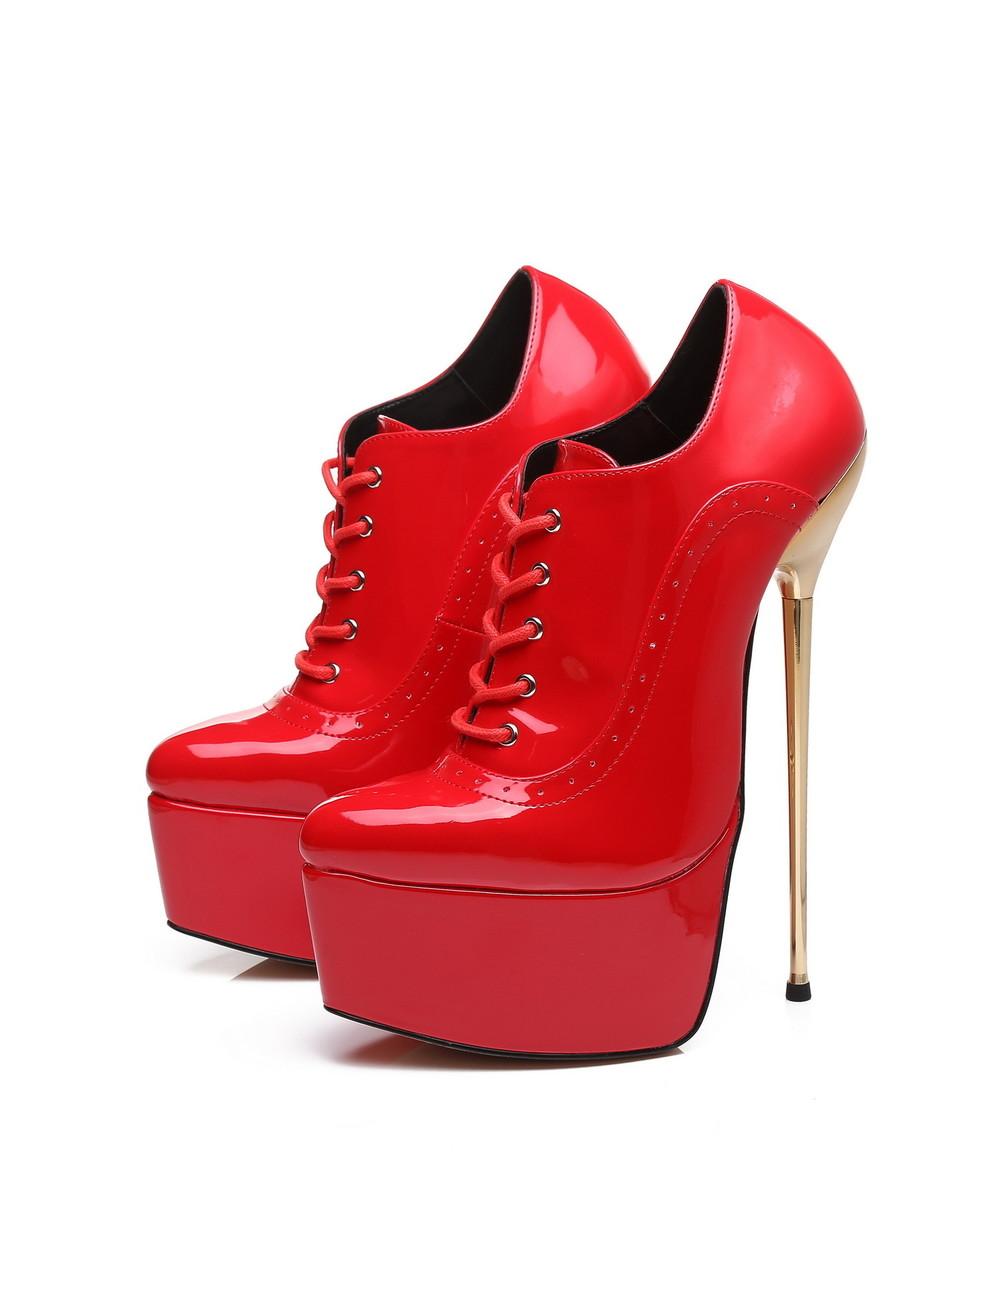 Giaro Red shiny Giaro ultra Fetish platform oxfords with gold heels